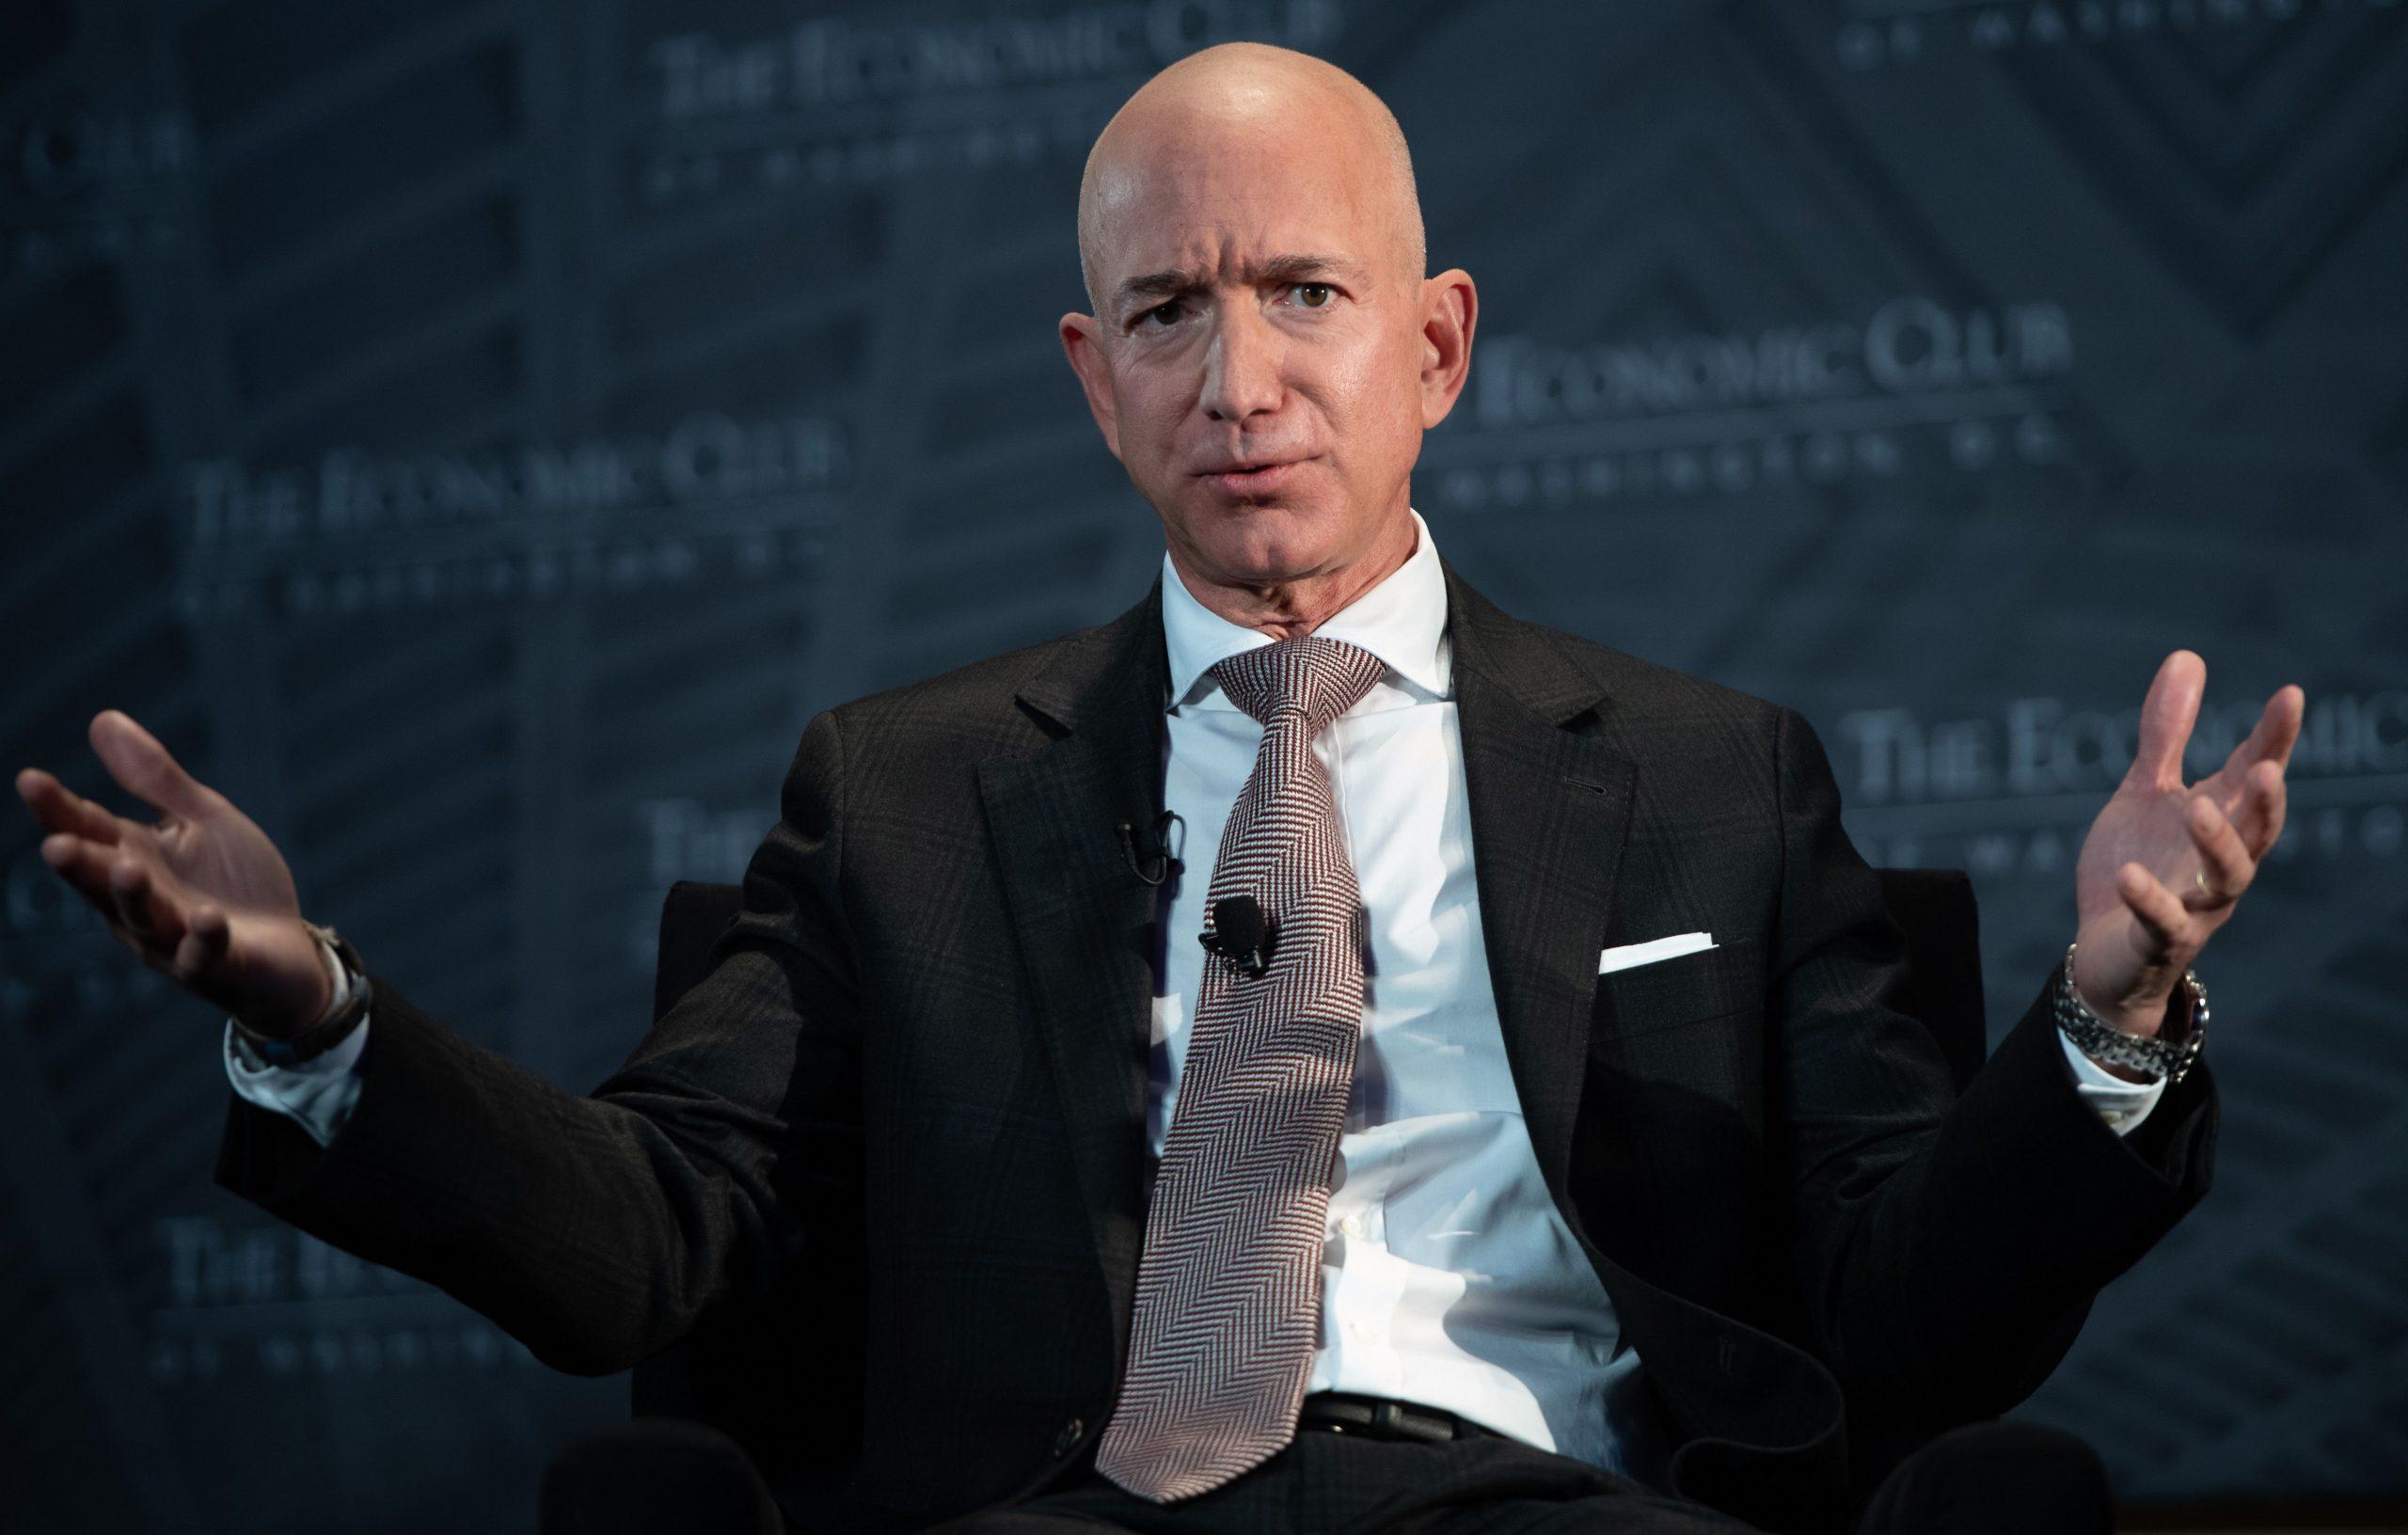 Congress panel calls on Amazon chief Bezos to testify